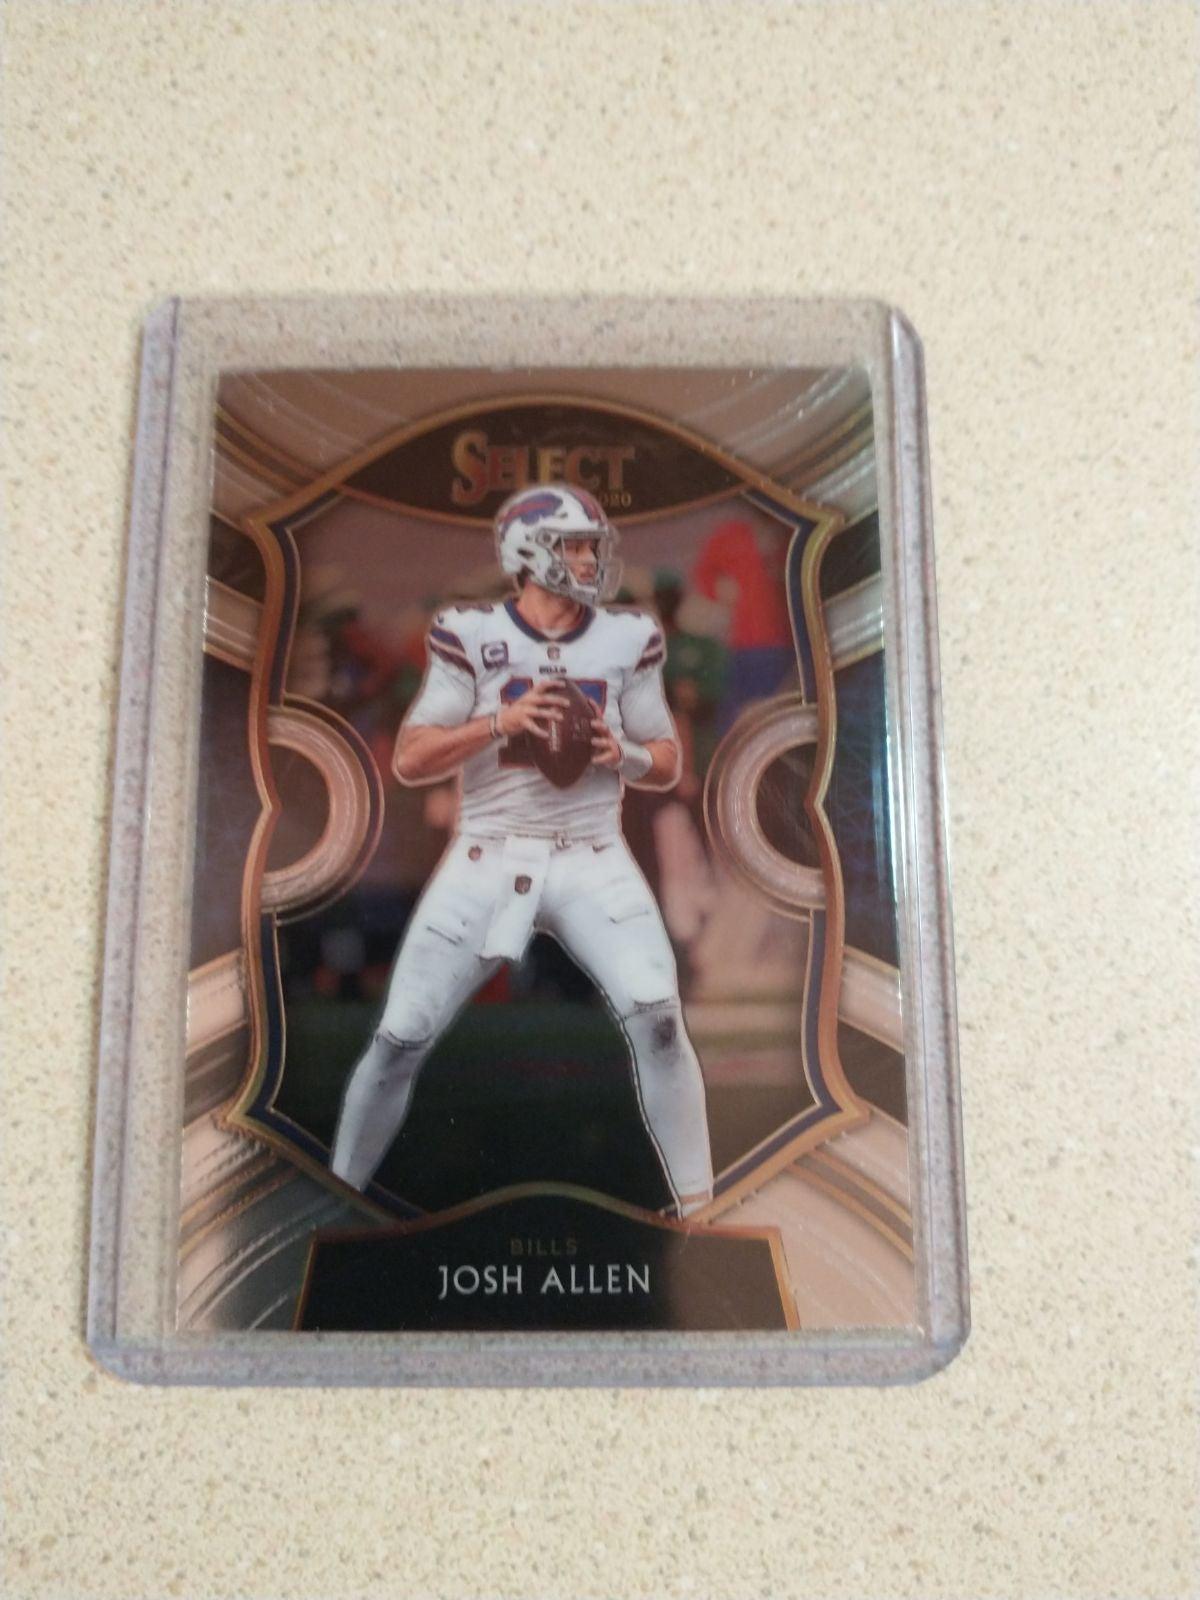 Josh Allen select 2020